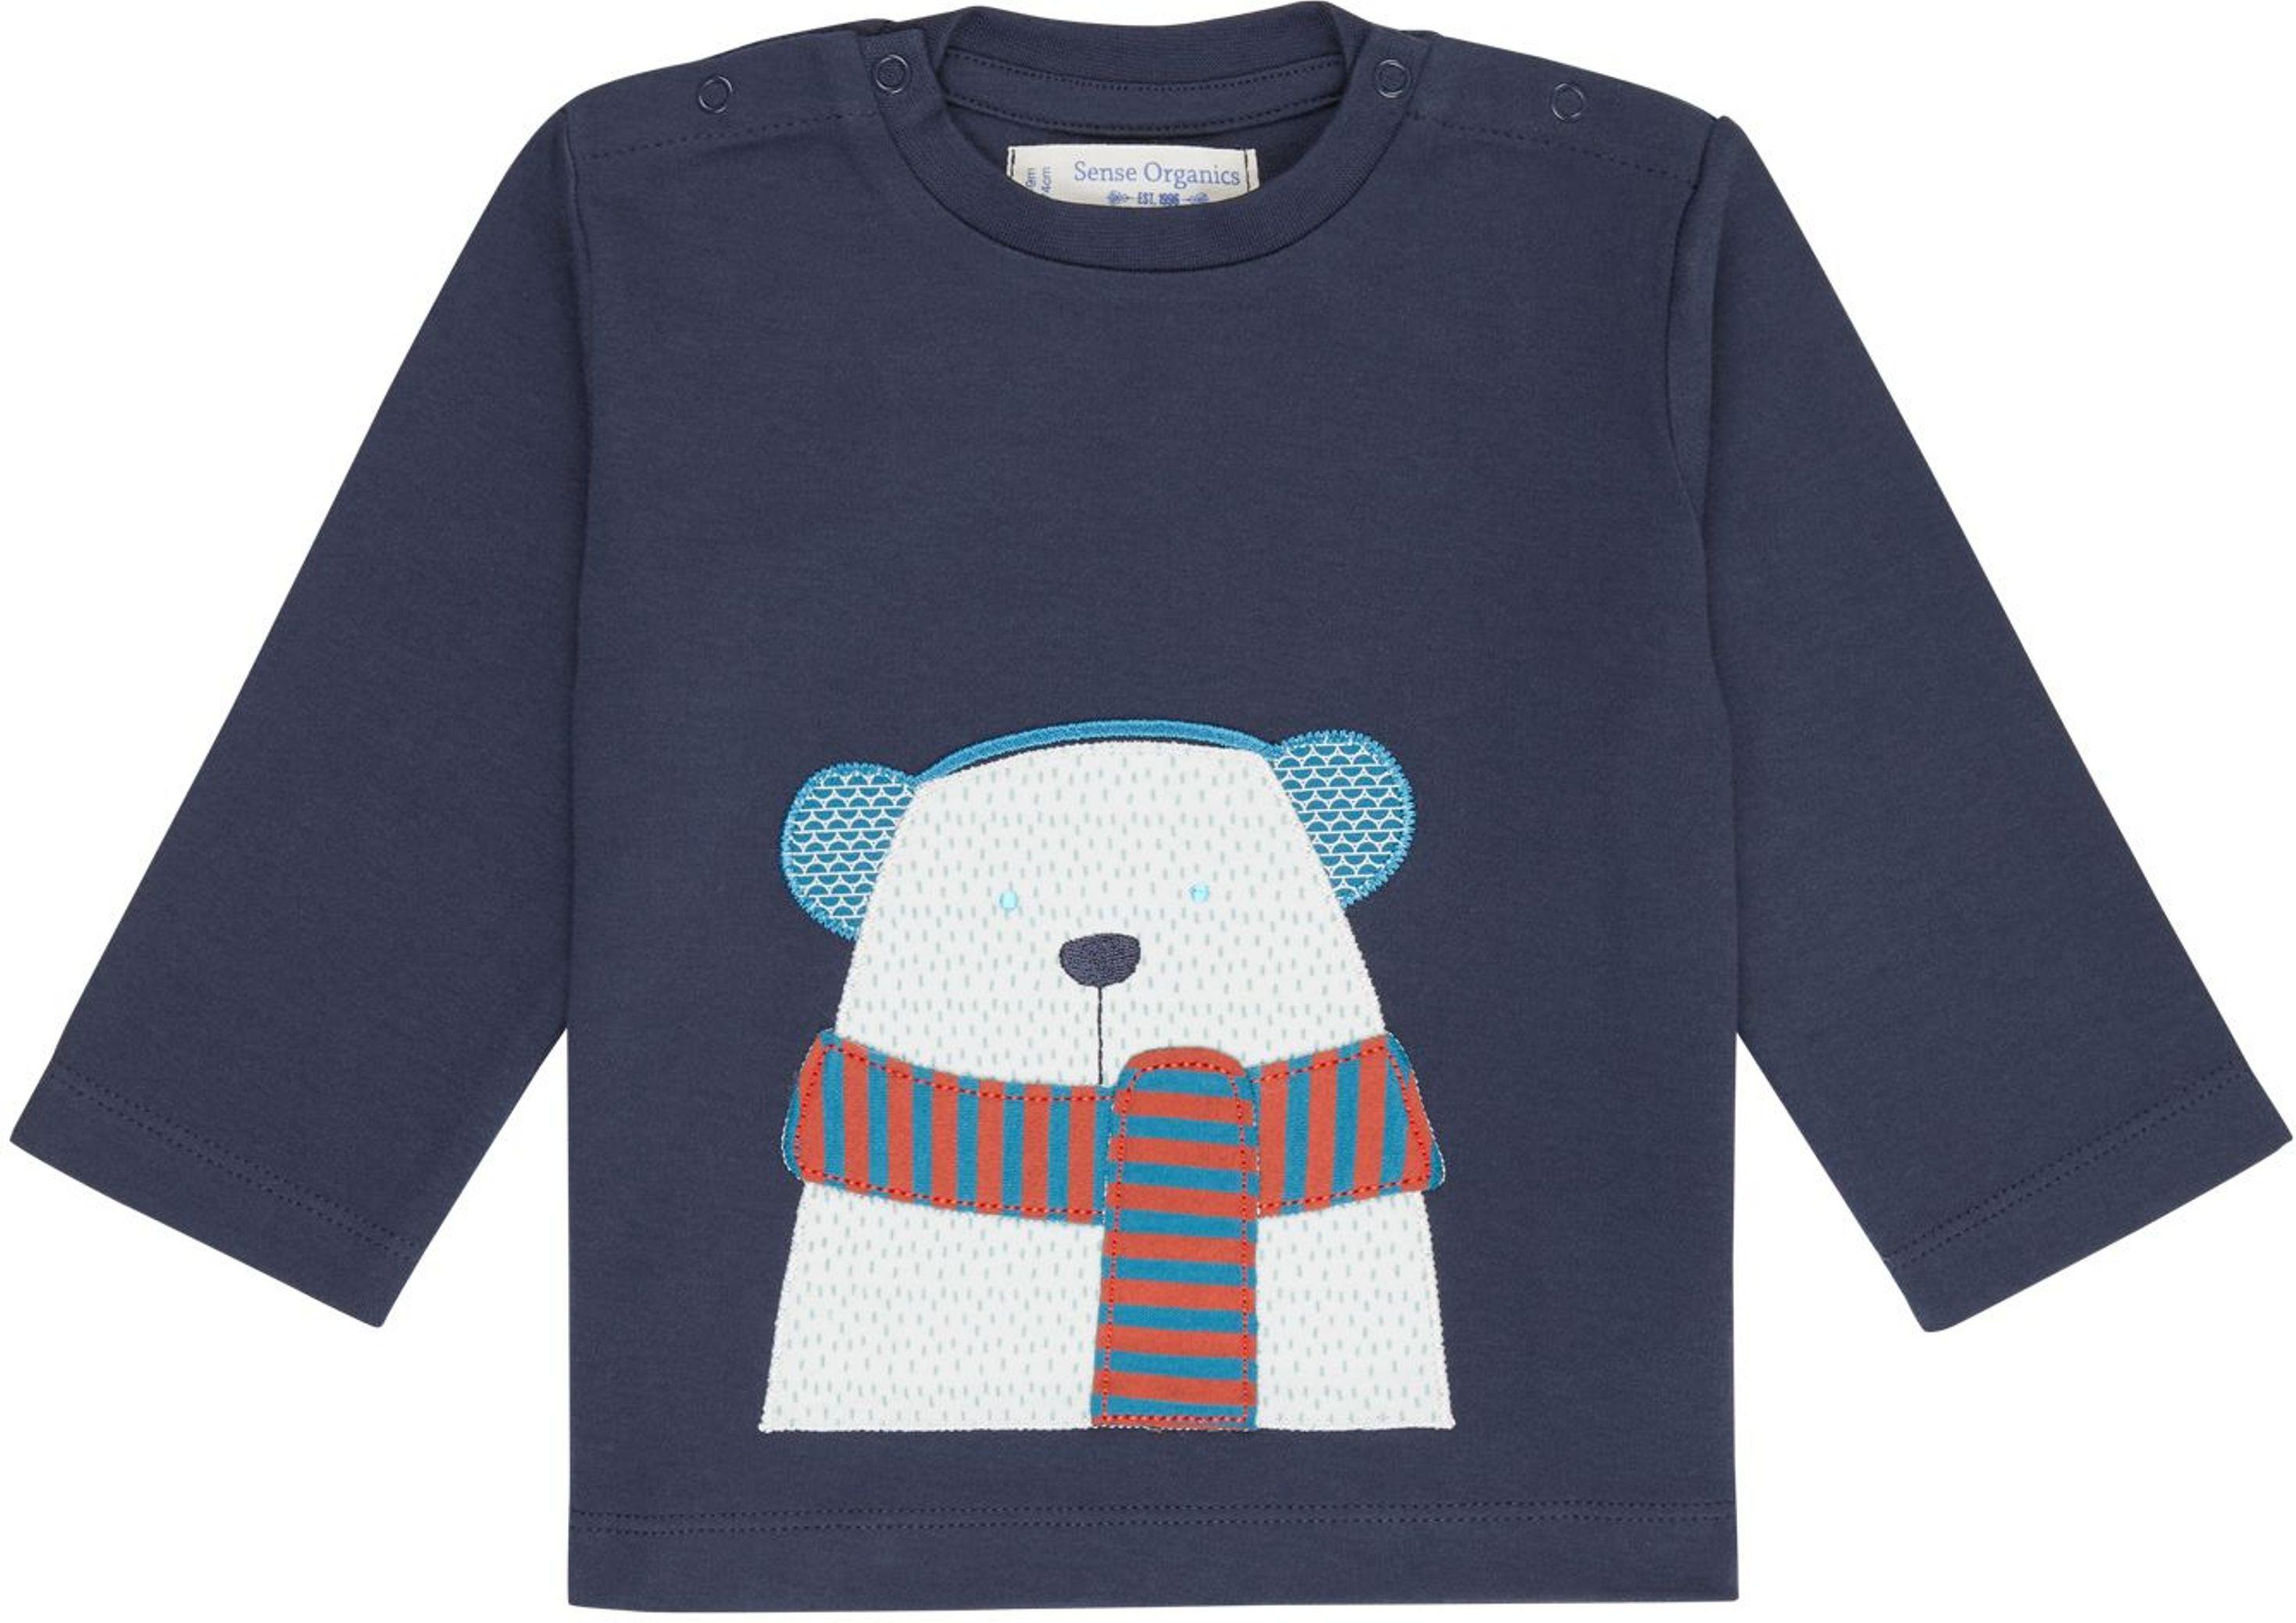 Sense Organic ELAN Baby Shirt L/S navy/polar bear